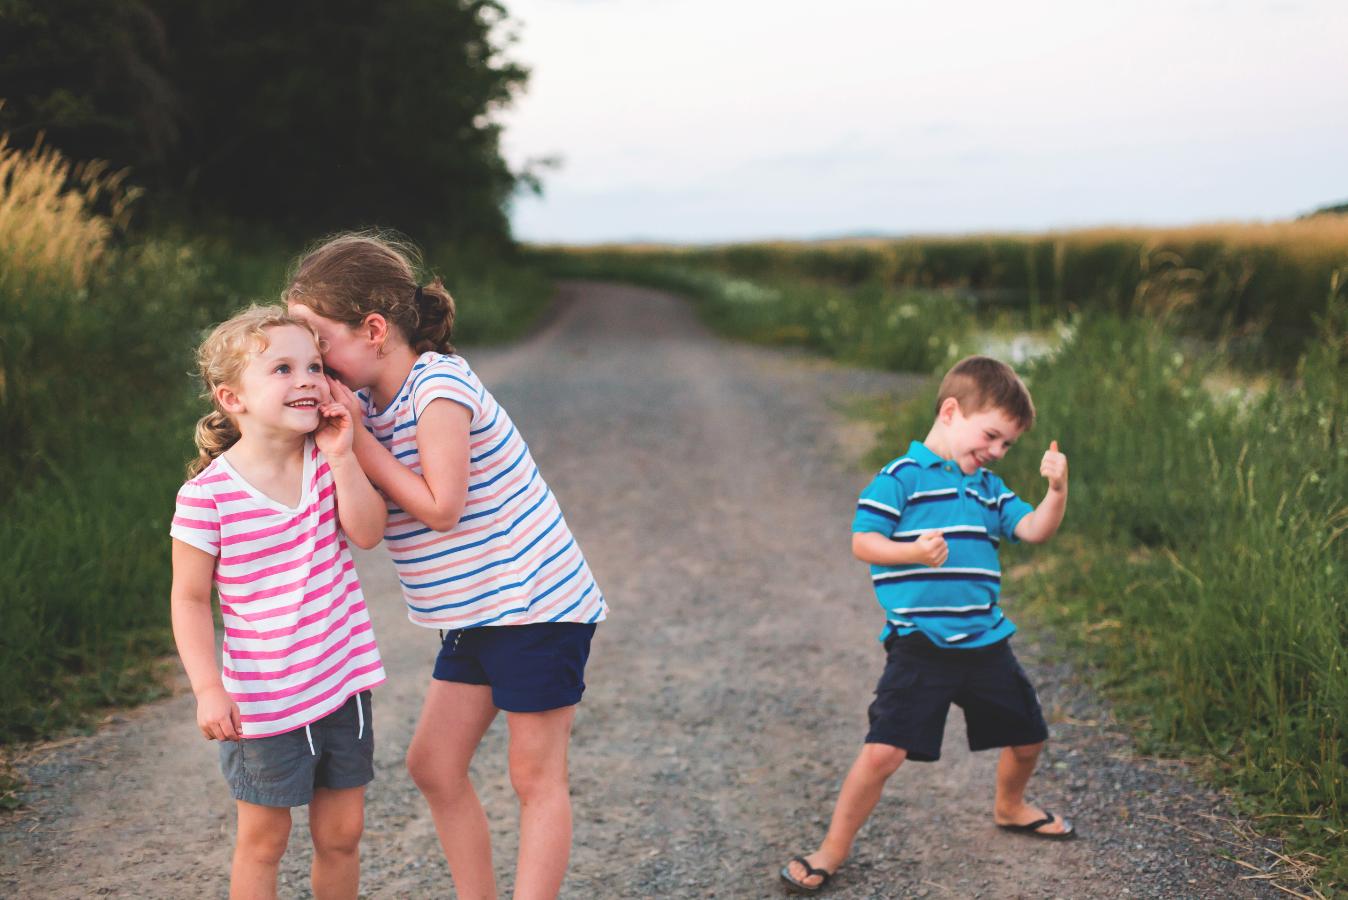 Hamilton-Toronto-Burlington-Oakville-welland-Niagara-Cambridge-Dundas-Ontario-Family-photographer-photography-Moments-by-Lauren-Nova-Scotia-Antigonish-Lifestyle-Session-Image-Photo-23.png